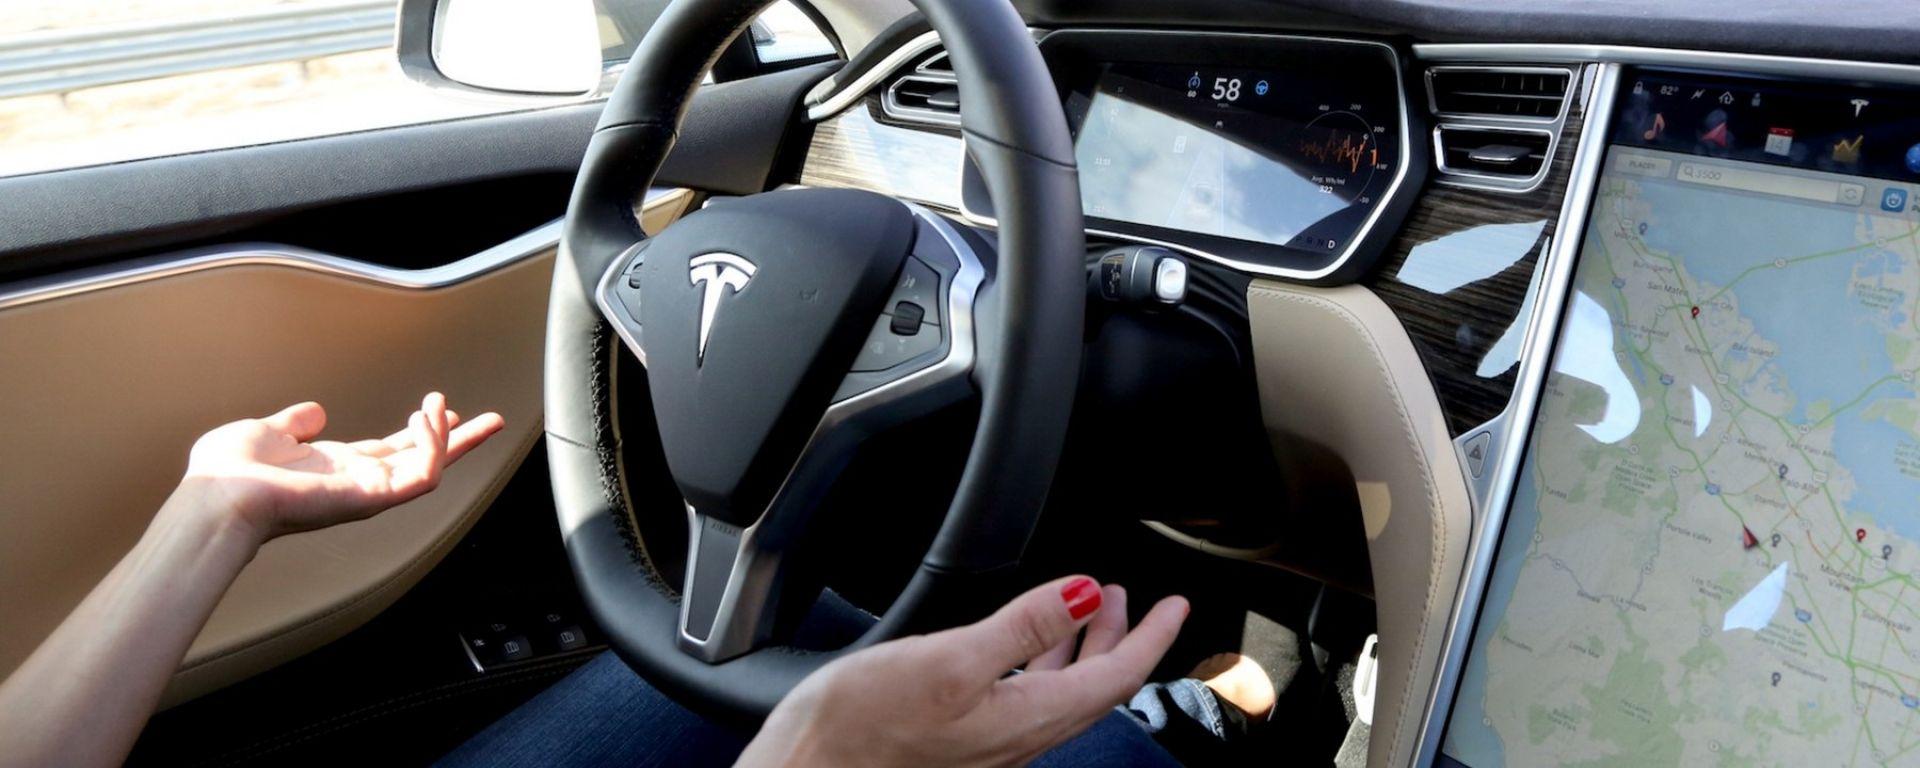 Tesla Autopilot in azione